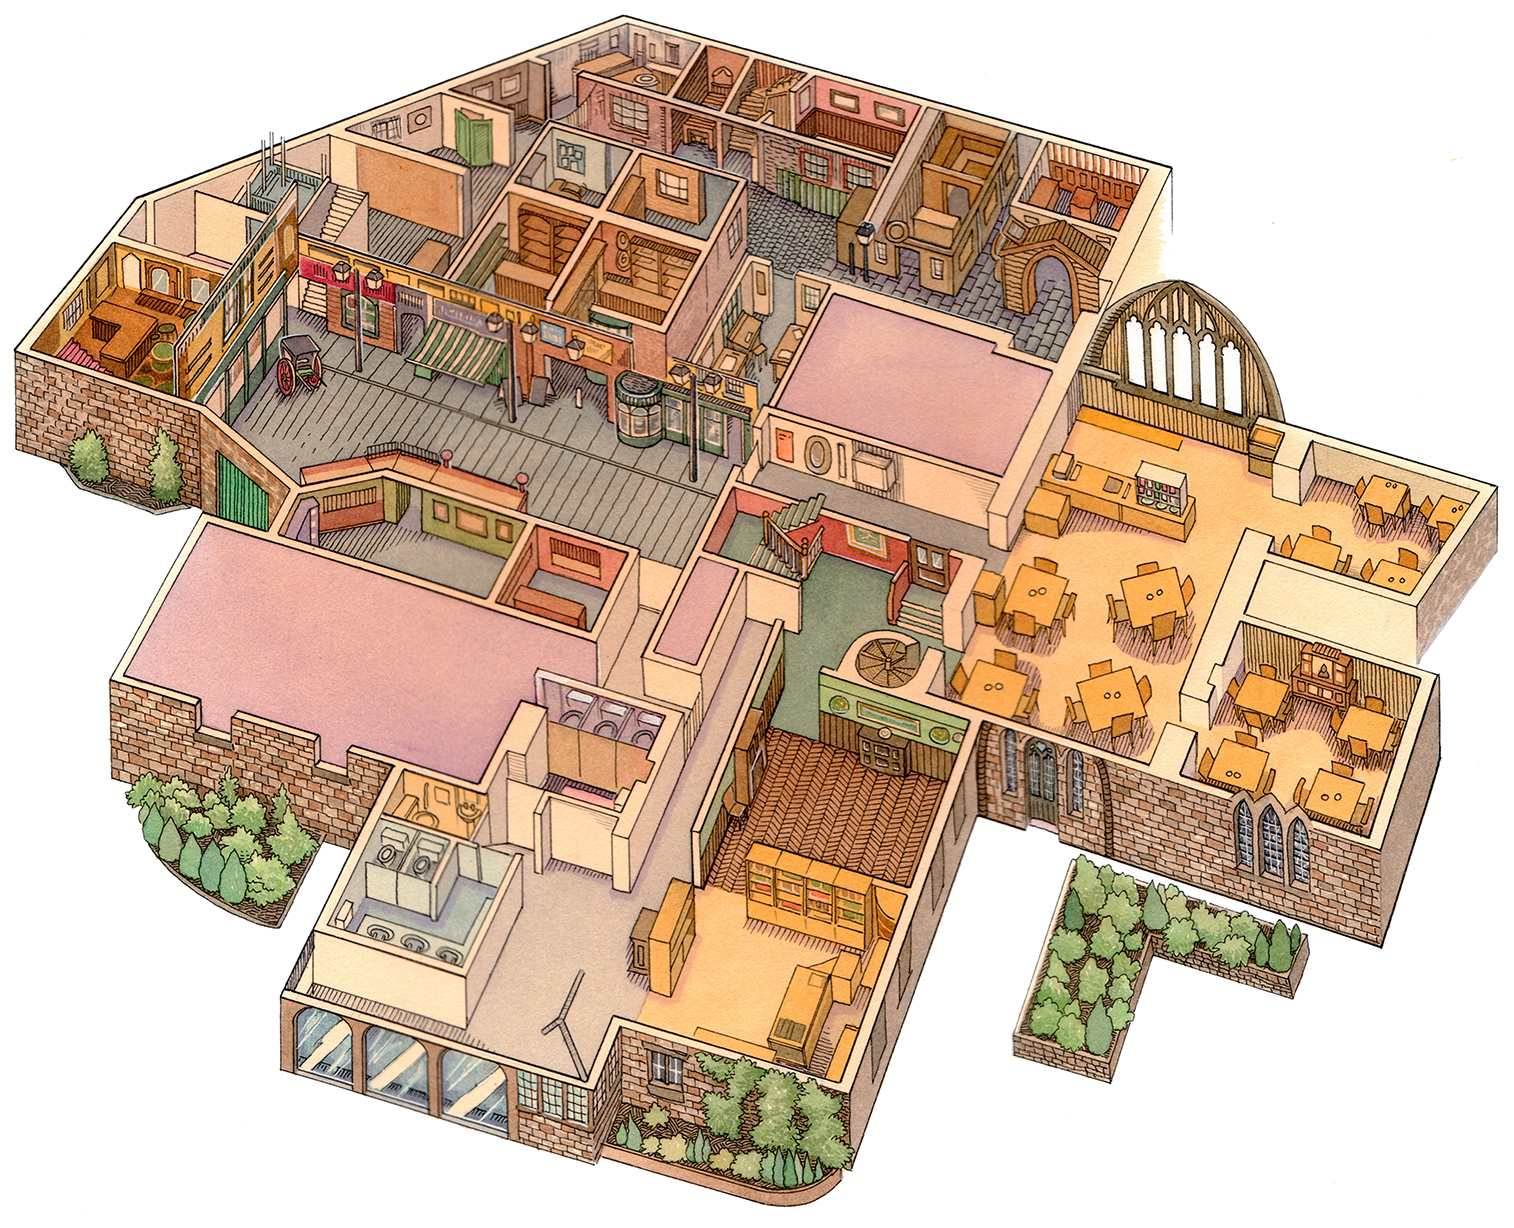 Kirkstall Abbey Floorplan